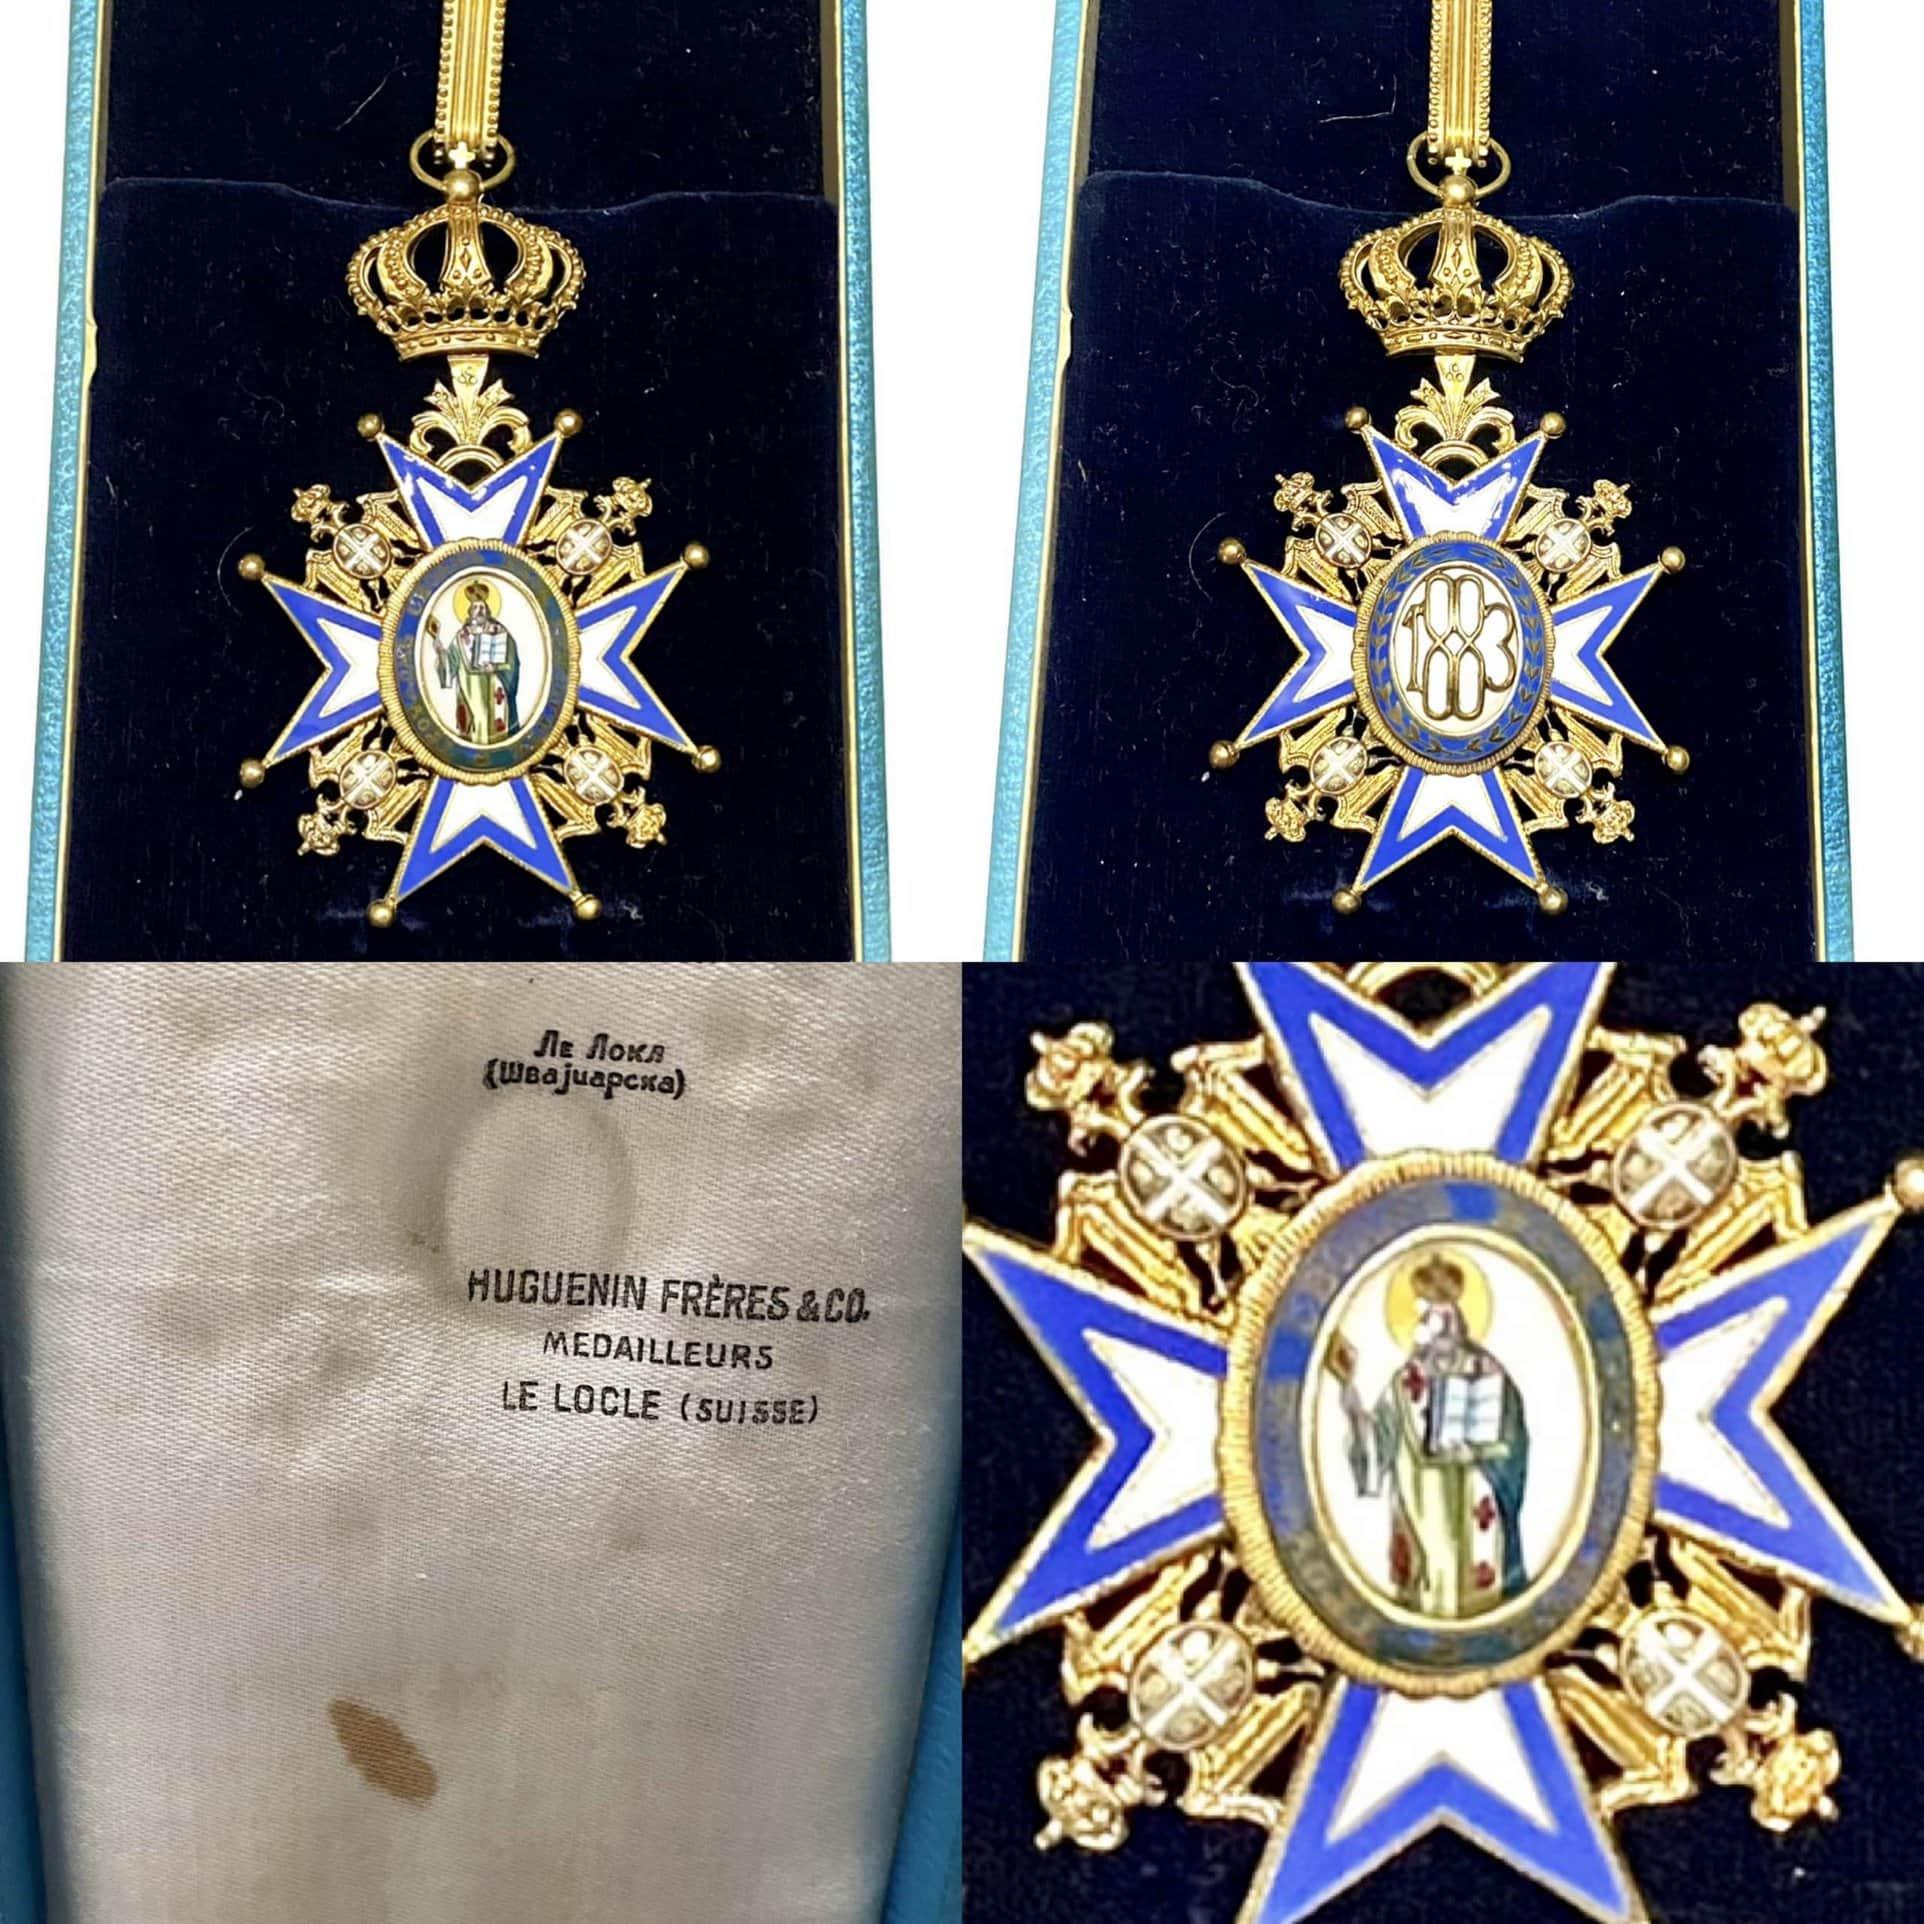 Serbian Order of St. Sava; Third Class Commander Cross Παράσημα - Στρατιωτικά μετάλλια - Τάγματα αριστείας